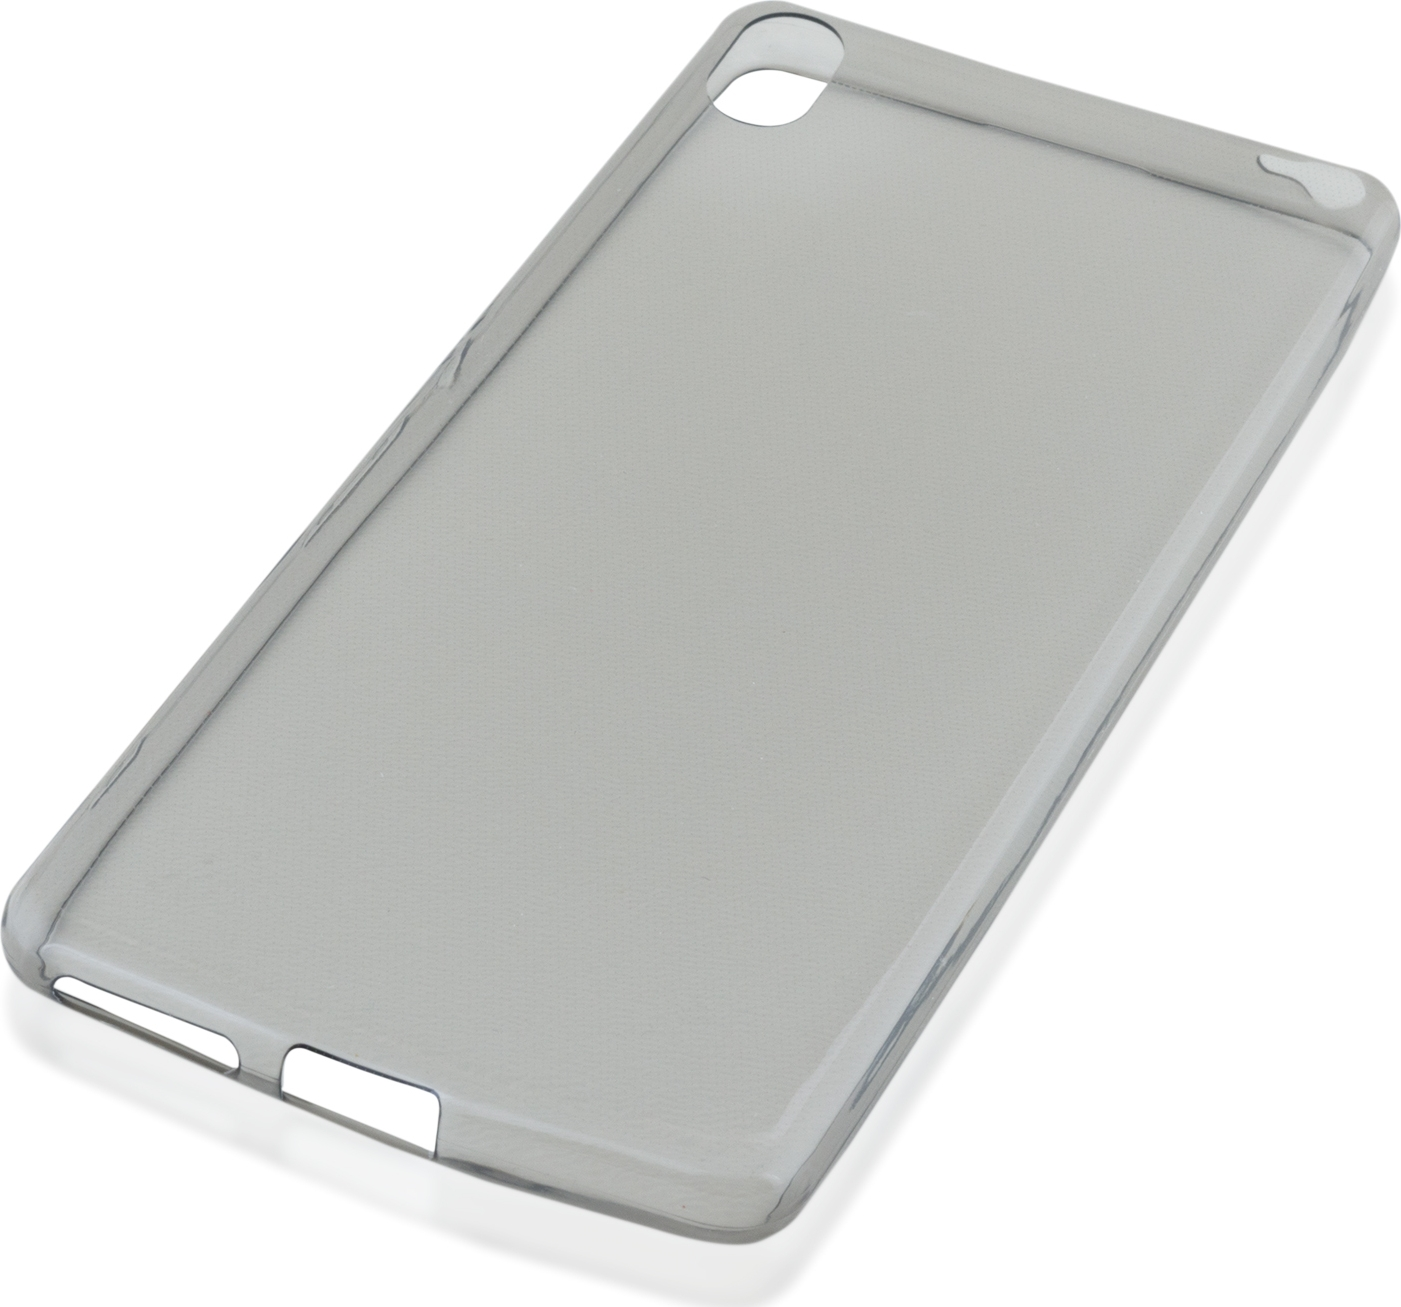 Чехол Brosco TPU для Sony Xperia XA, черный цена и фото